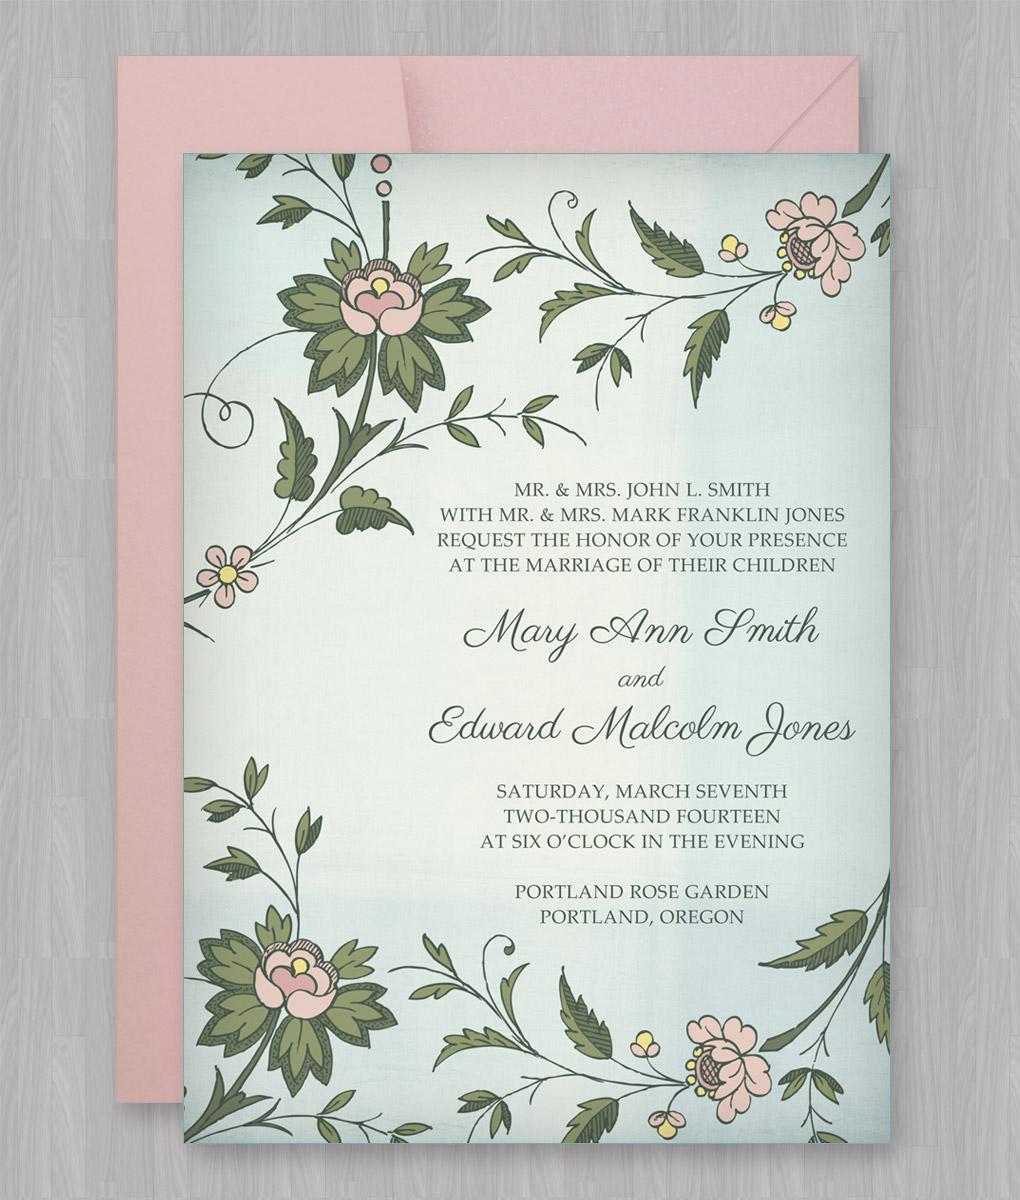 Watercolor Flowers Invitation Template